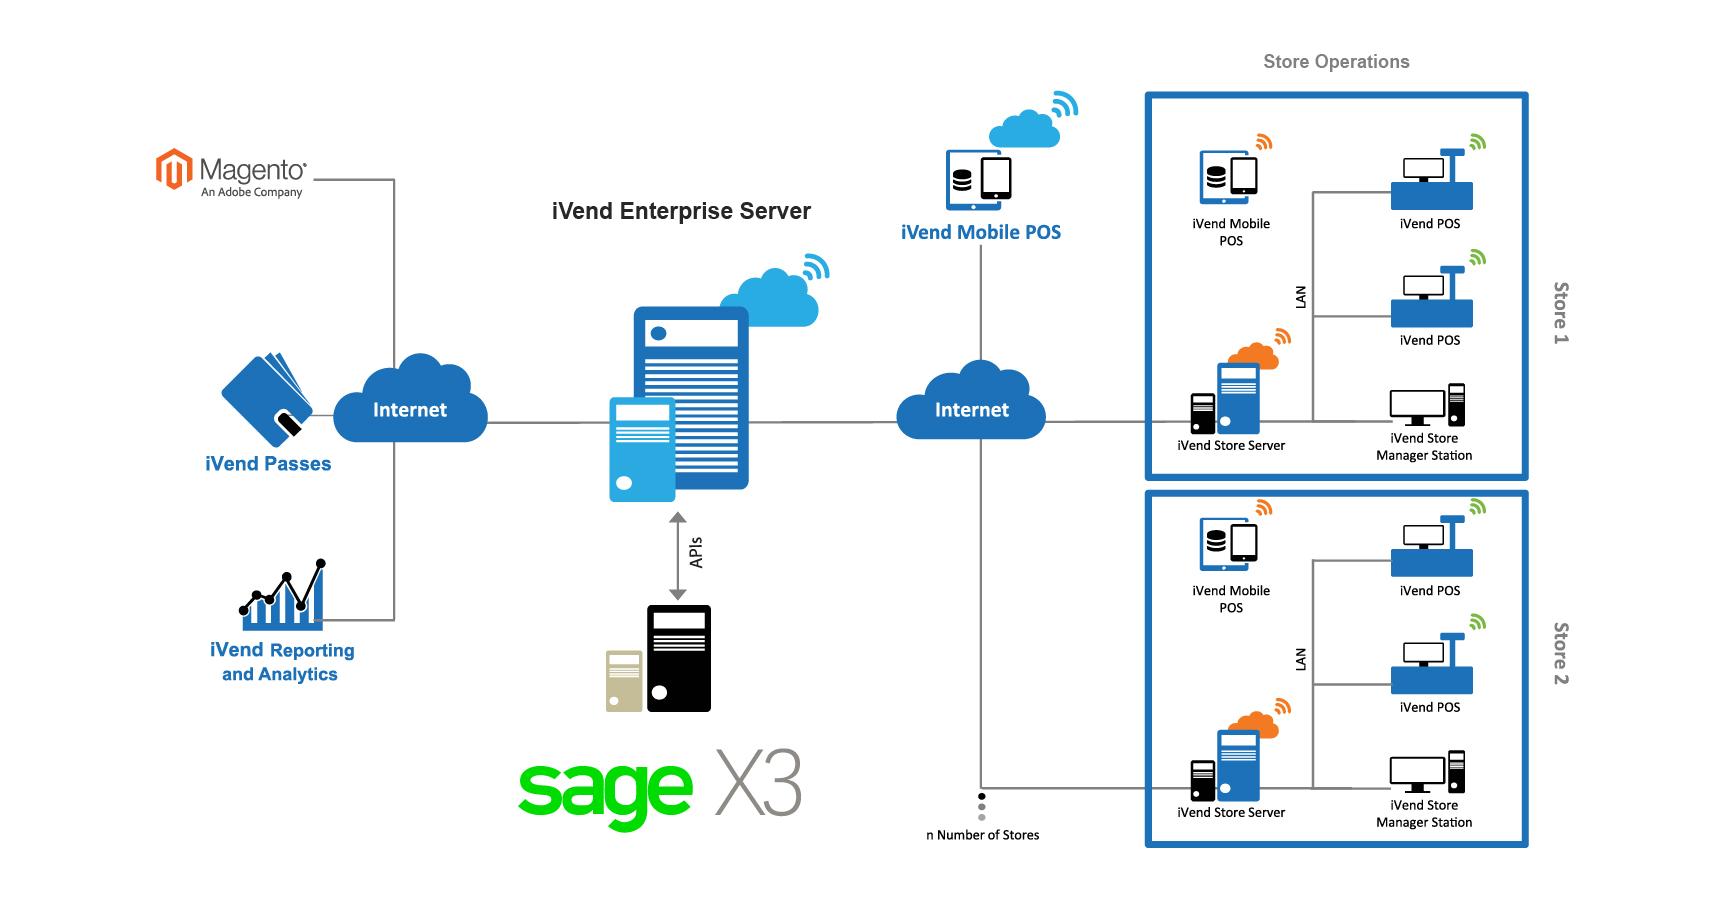 SAGE X3 | iVend Retail